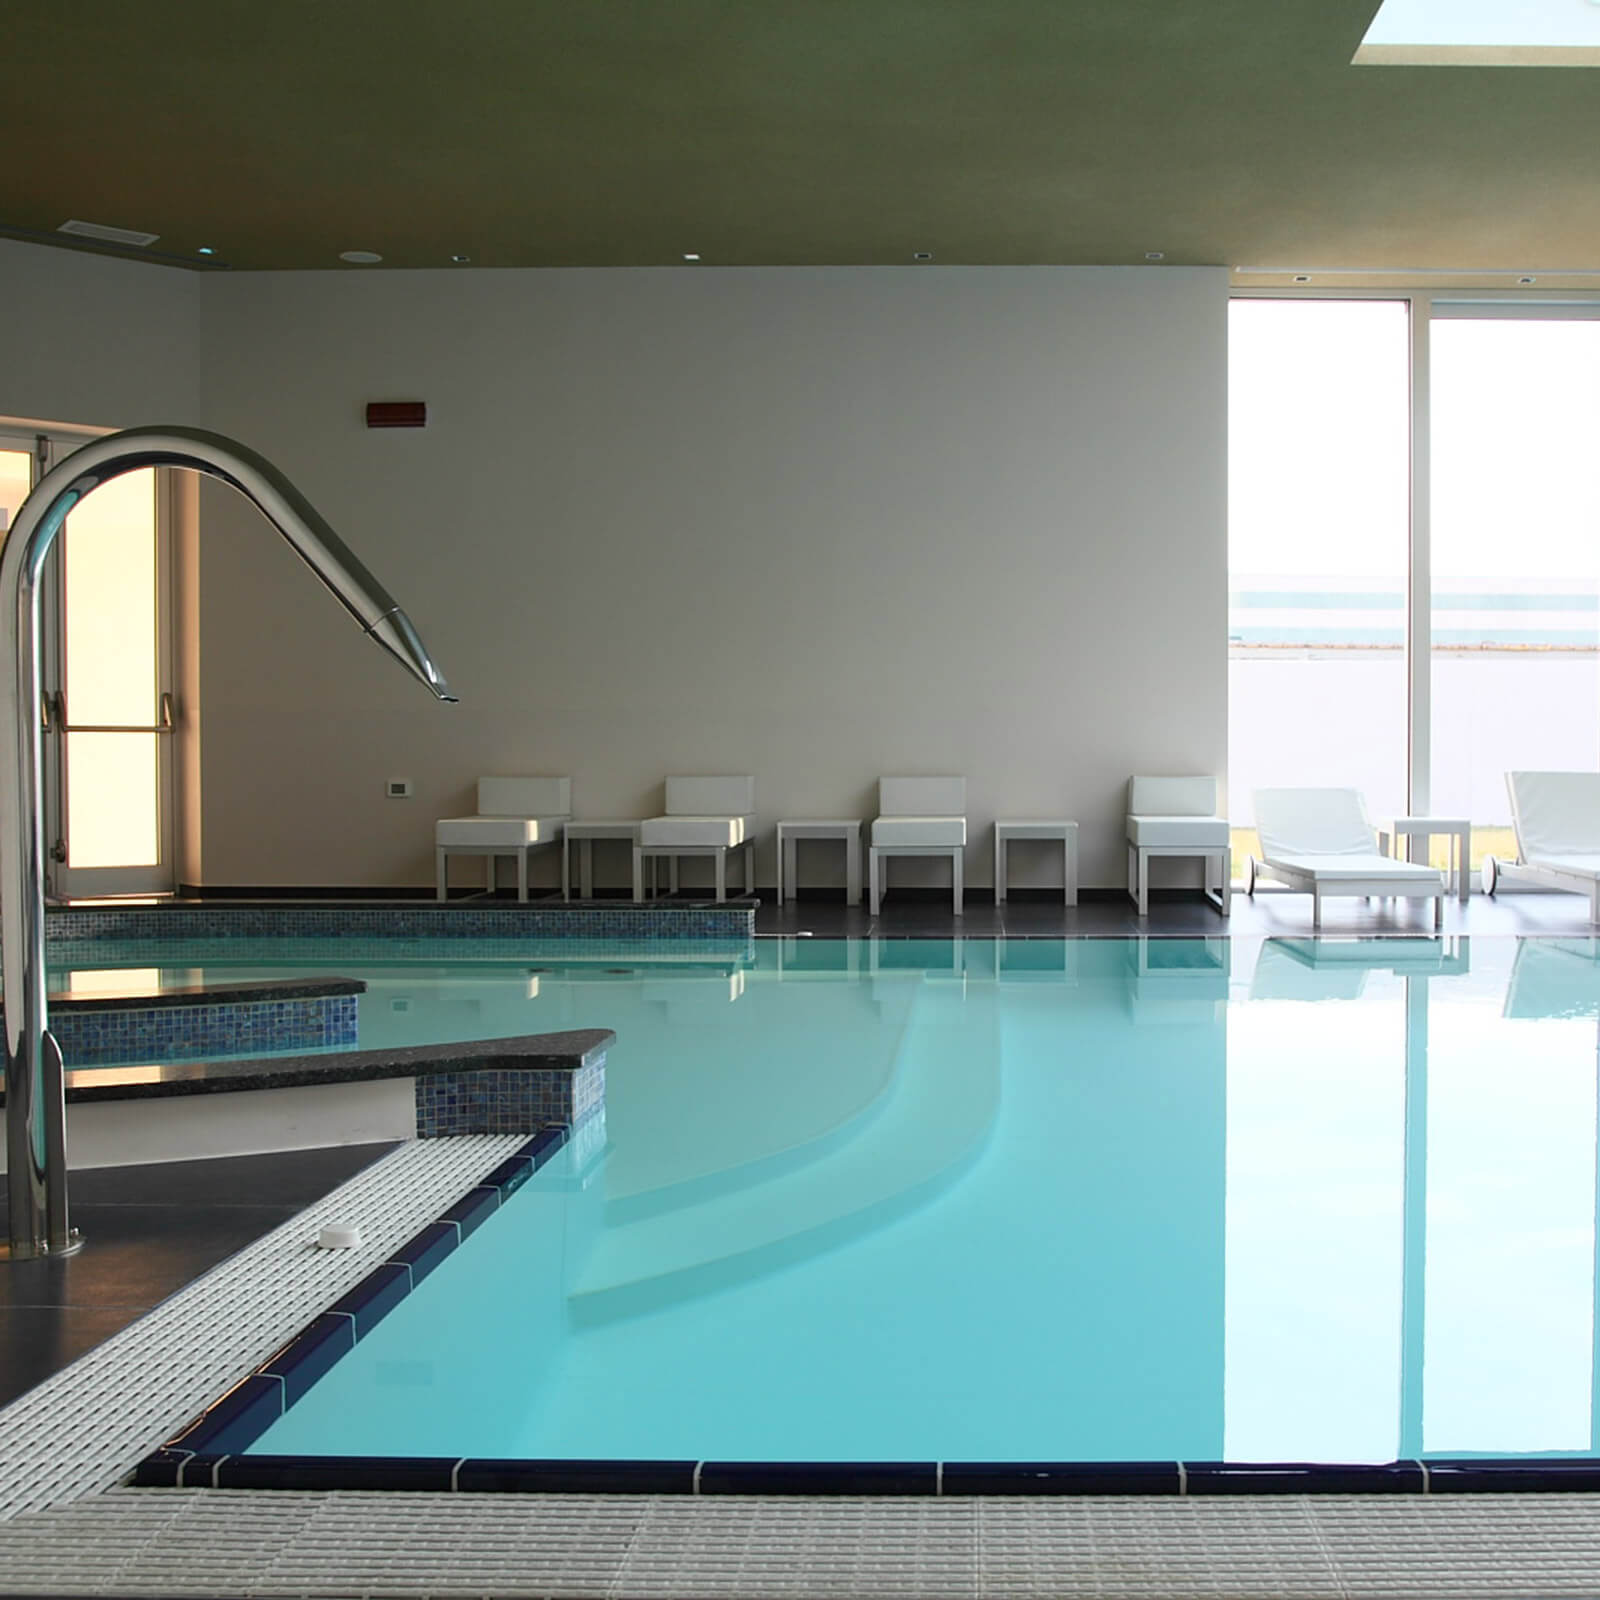 blu-moret-wellness-spa-centro-benessere-udine-piscina-interna2